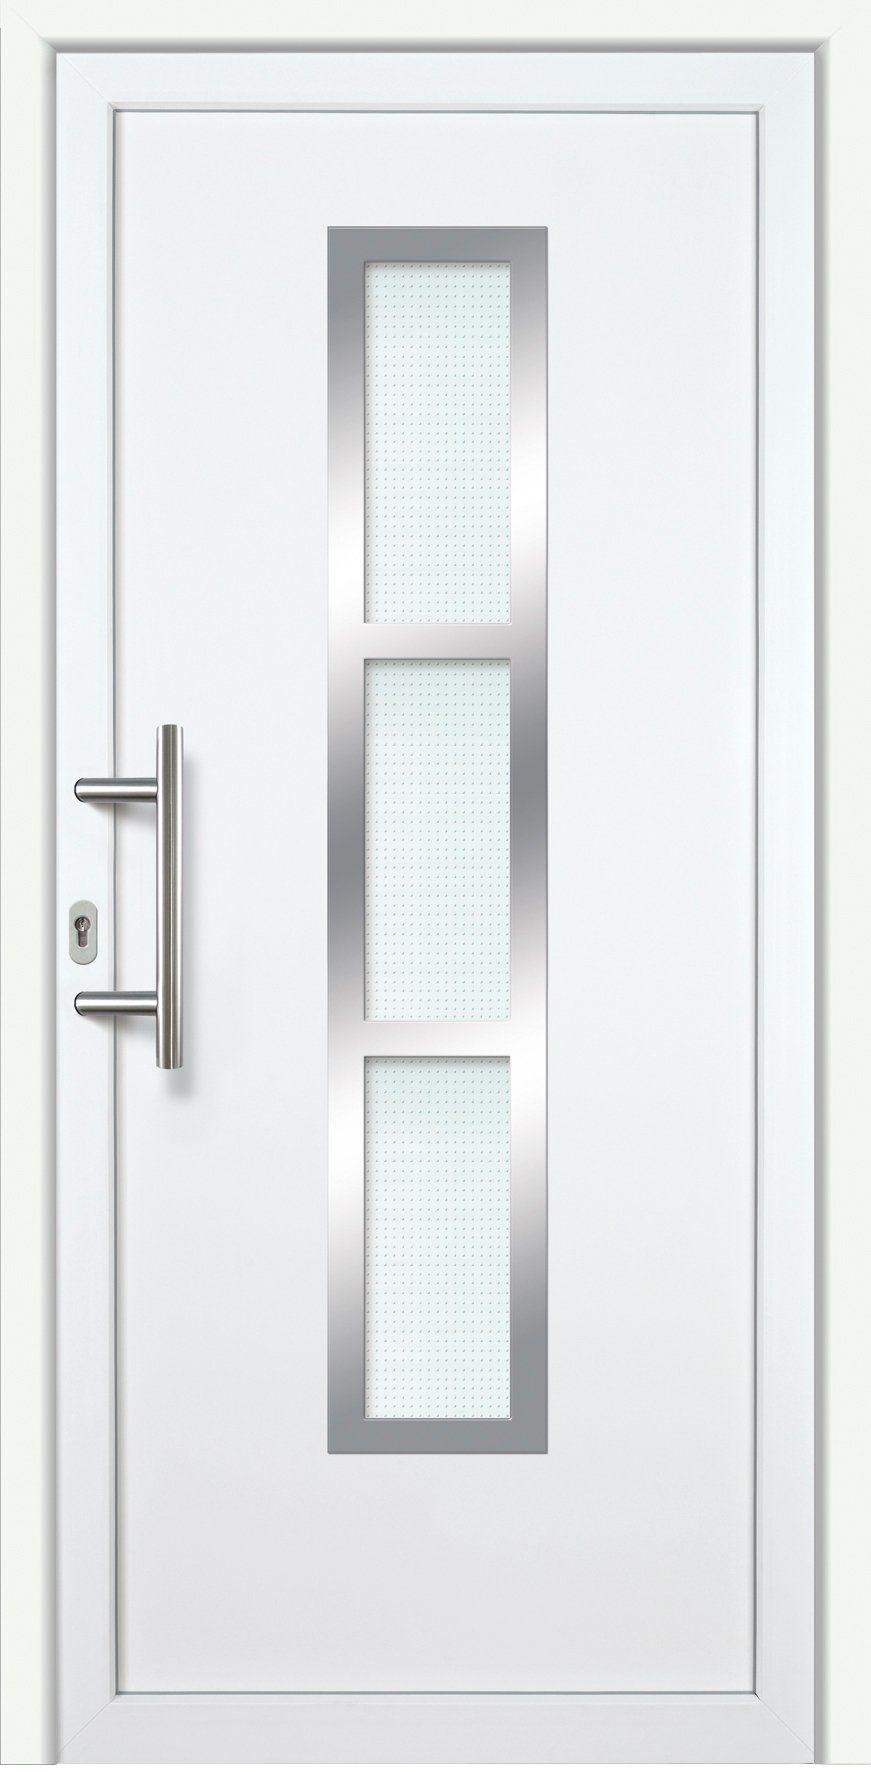 KM MEETH ZAUN GMBH Kunststoff-Haustür »K745P RS«, BxH: 98x198 cm, weiß, rechts